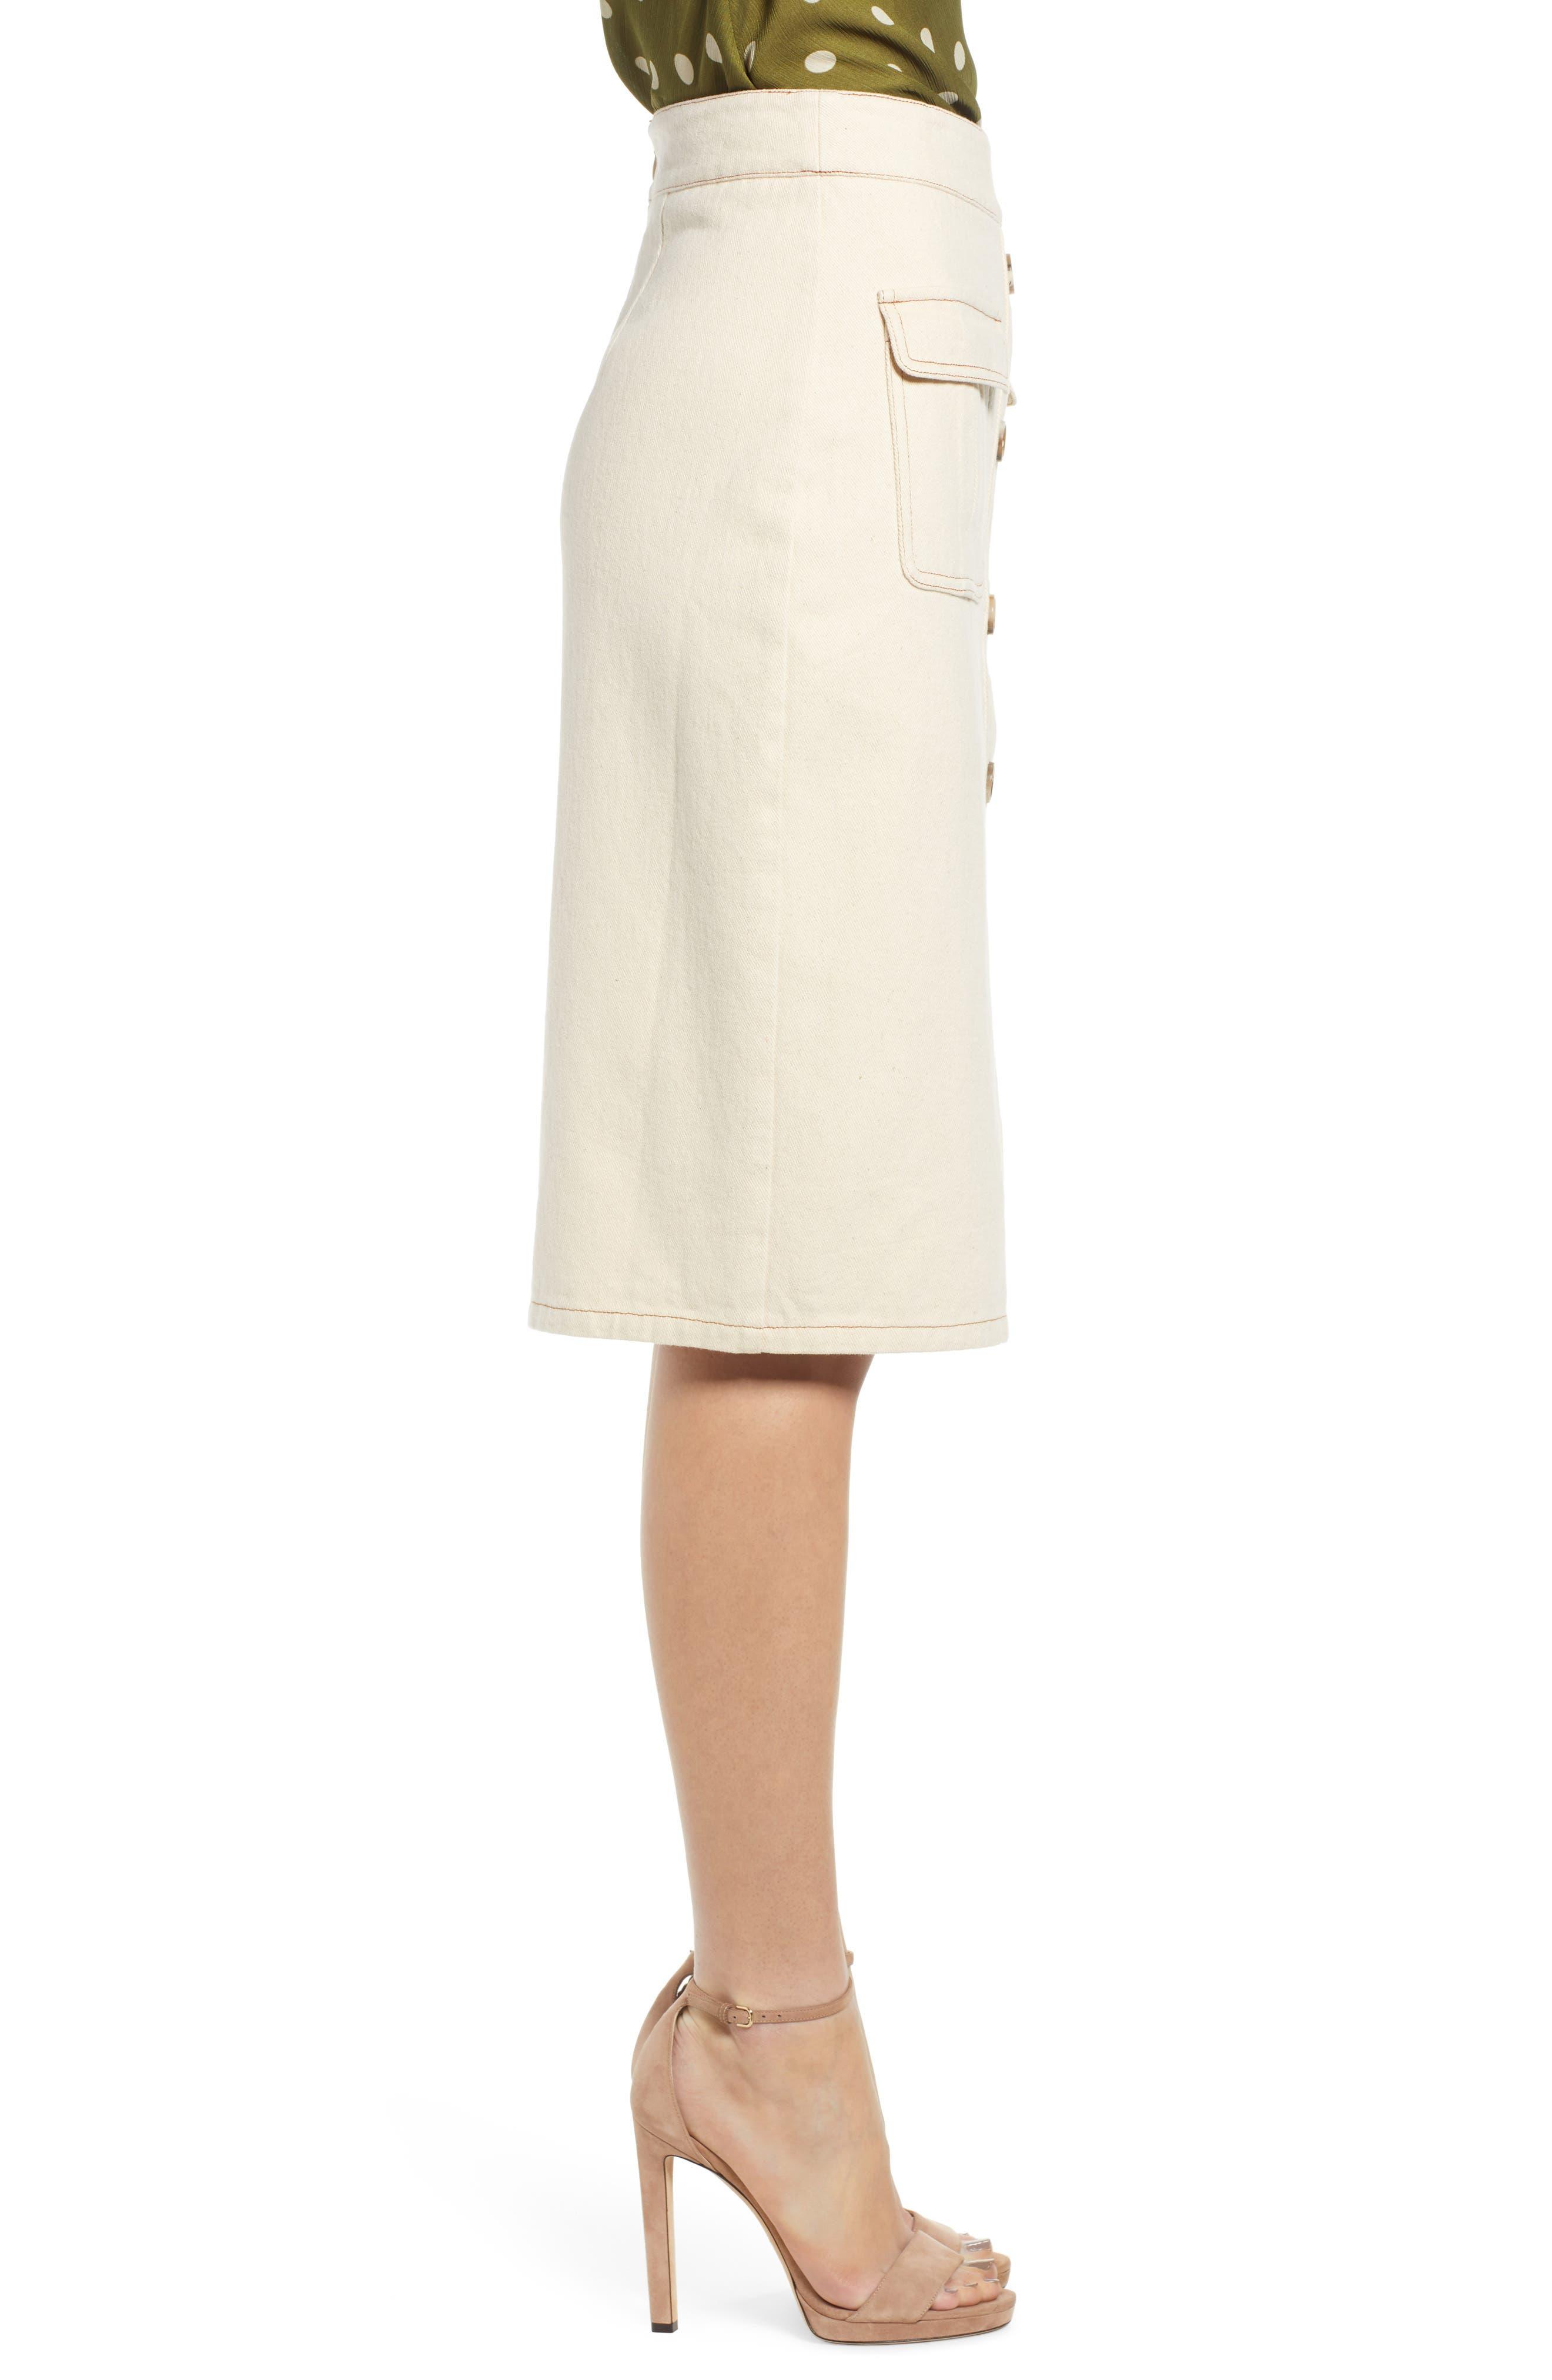 CHRISELLE LIM COLLECTION, Chriselle Lim Marine Midi Skirt, Alternate thumbnail 3, color, BONE